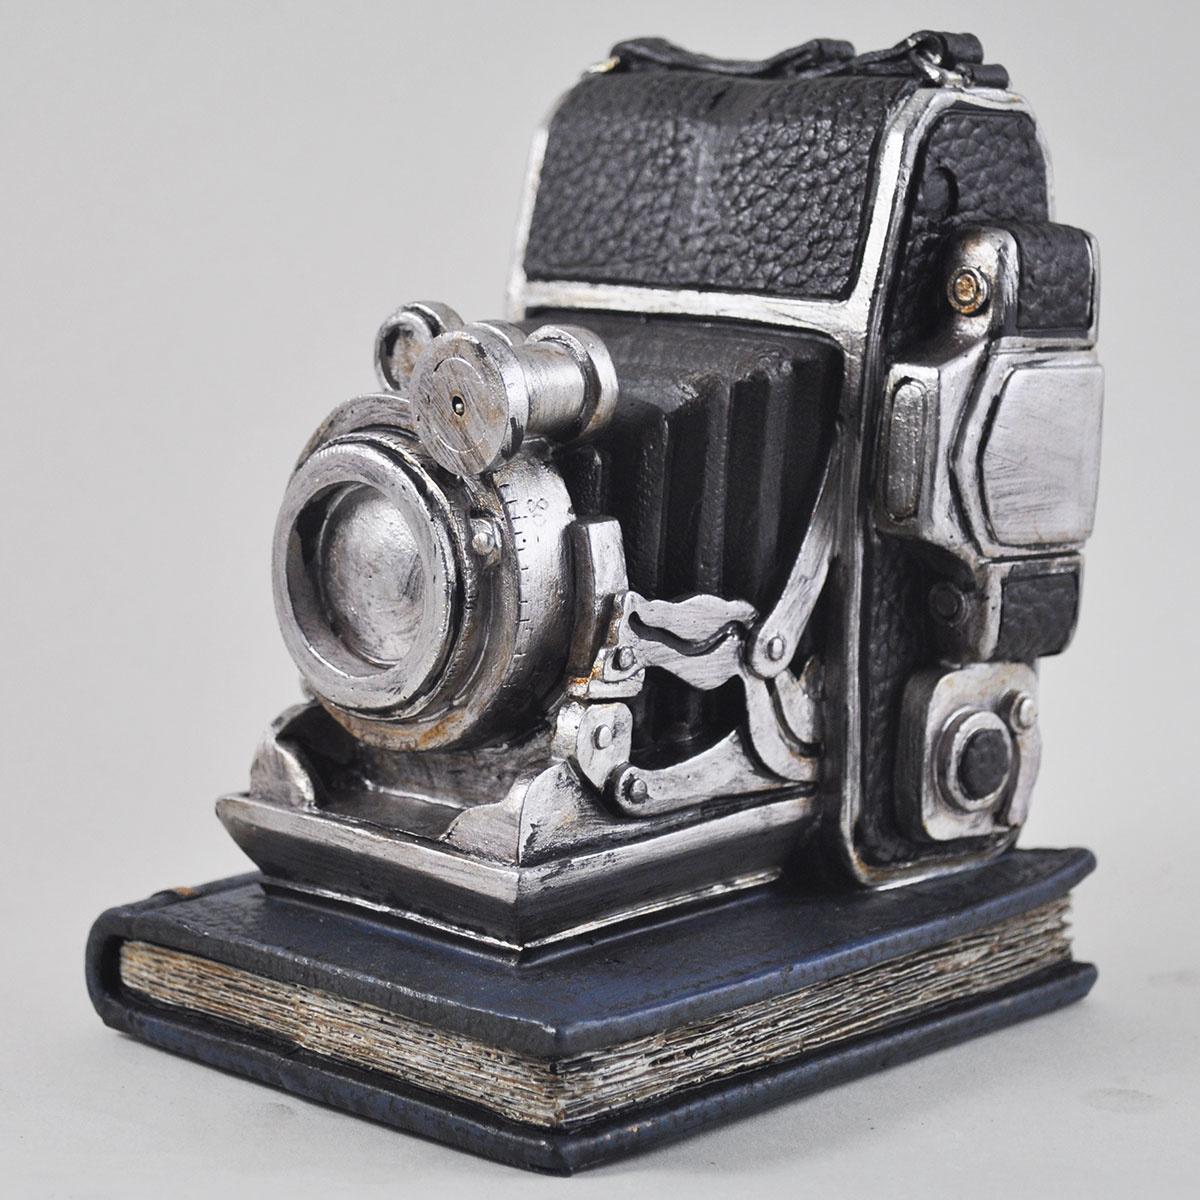 Vintage Camera Bookends